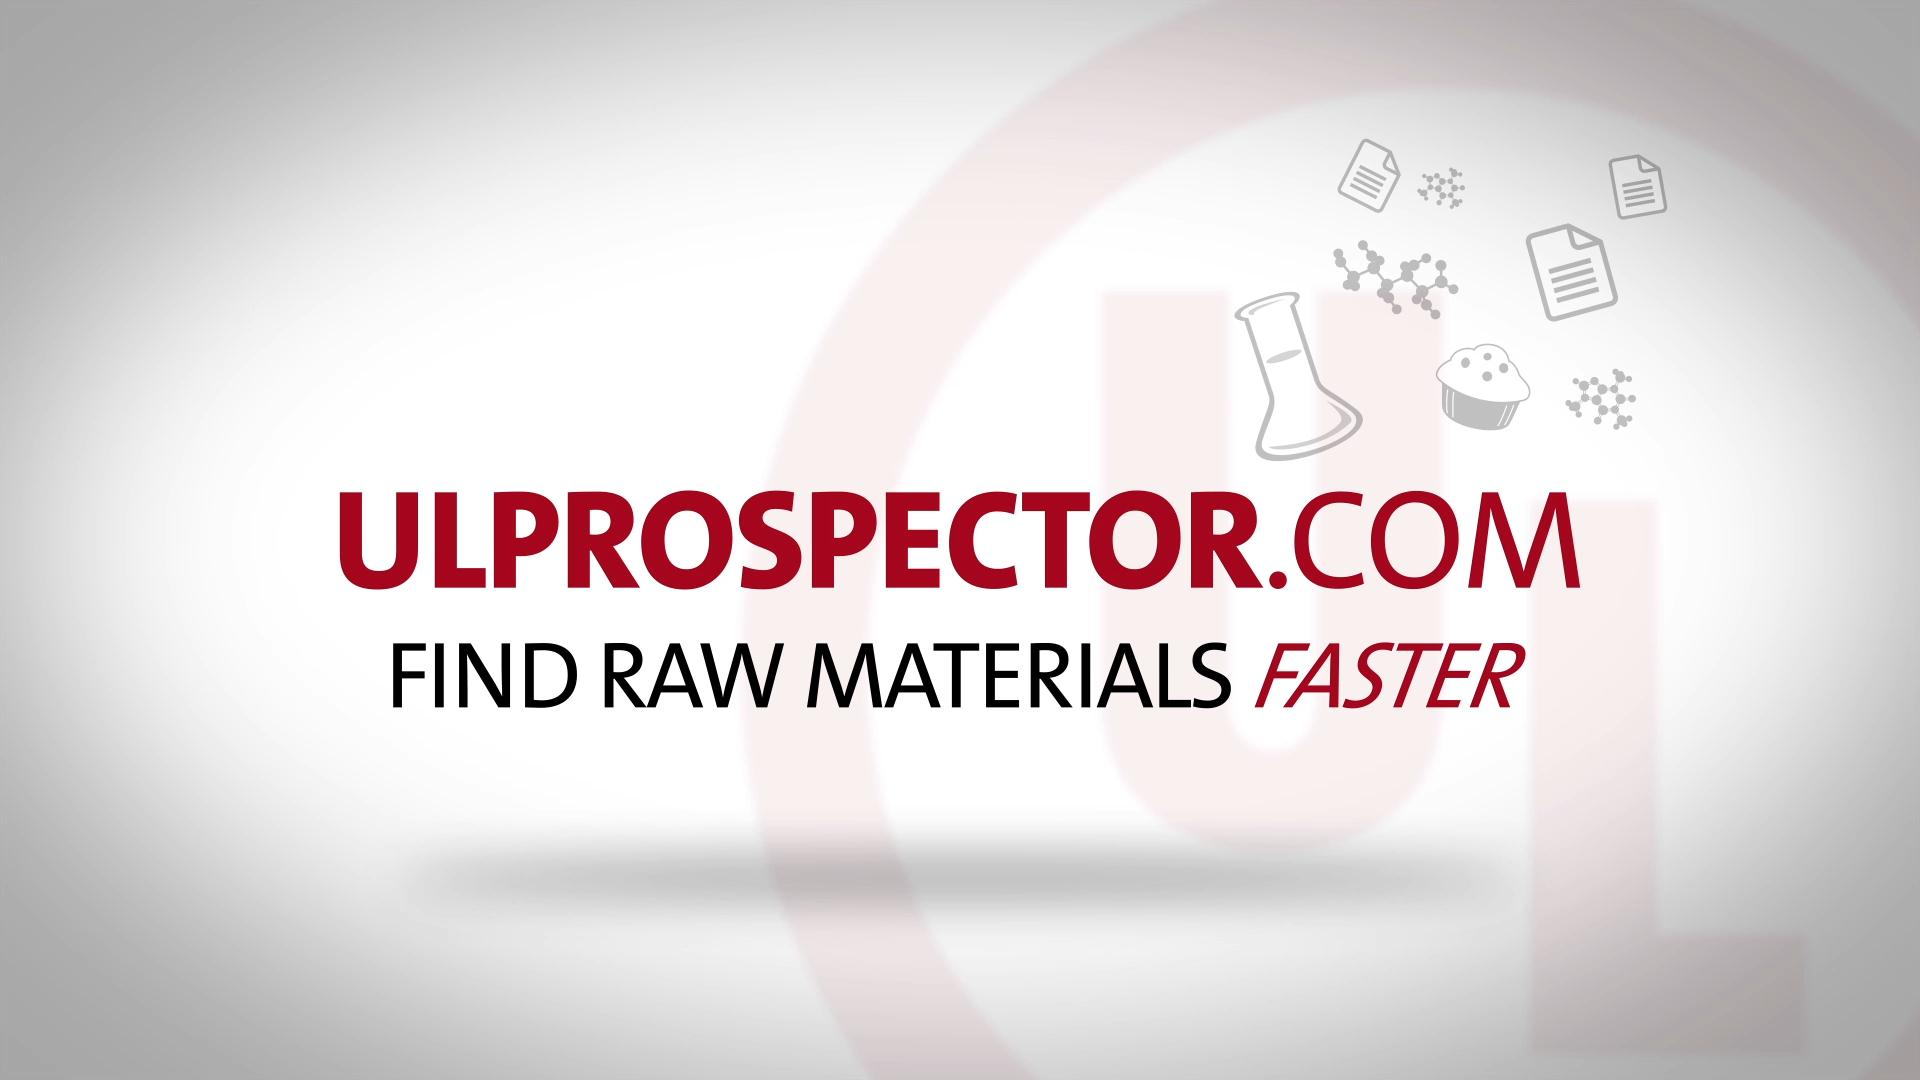 UL Prospector